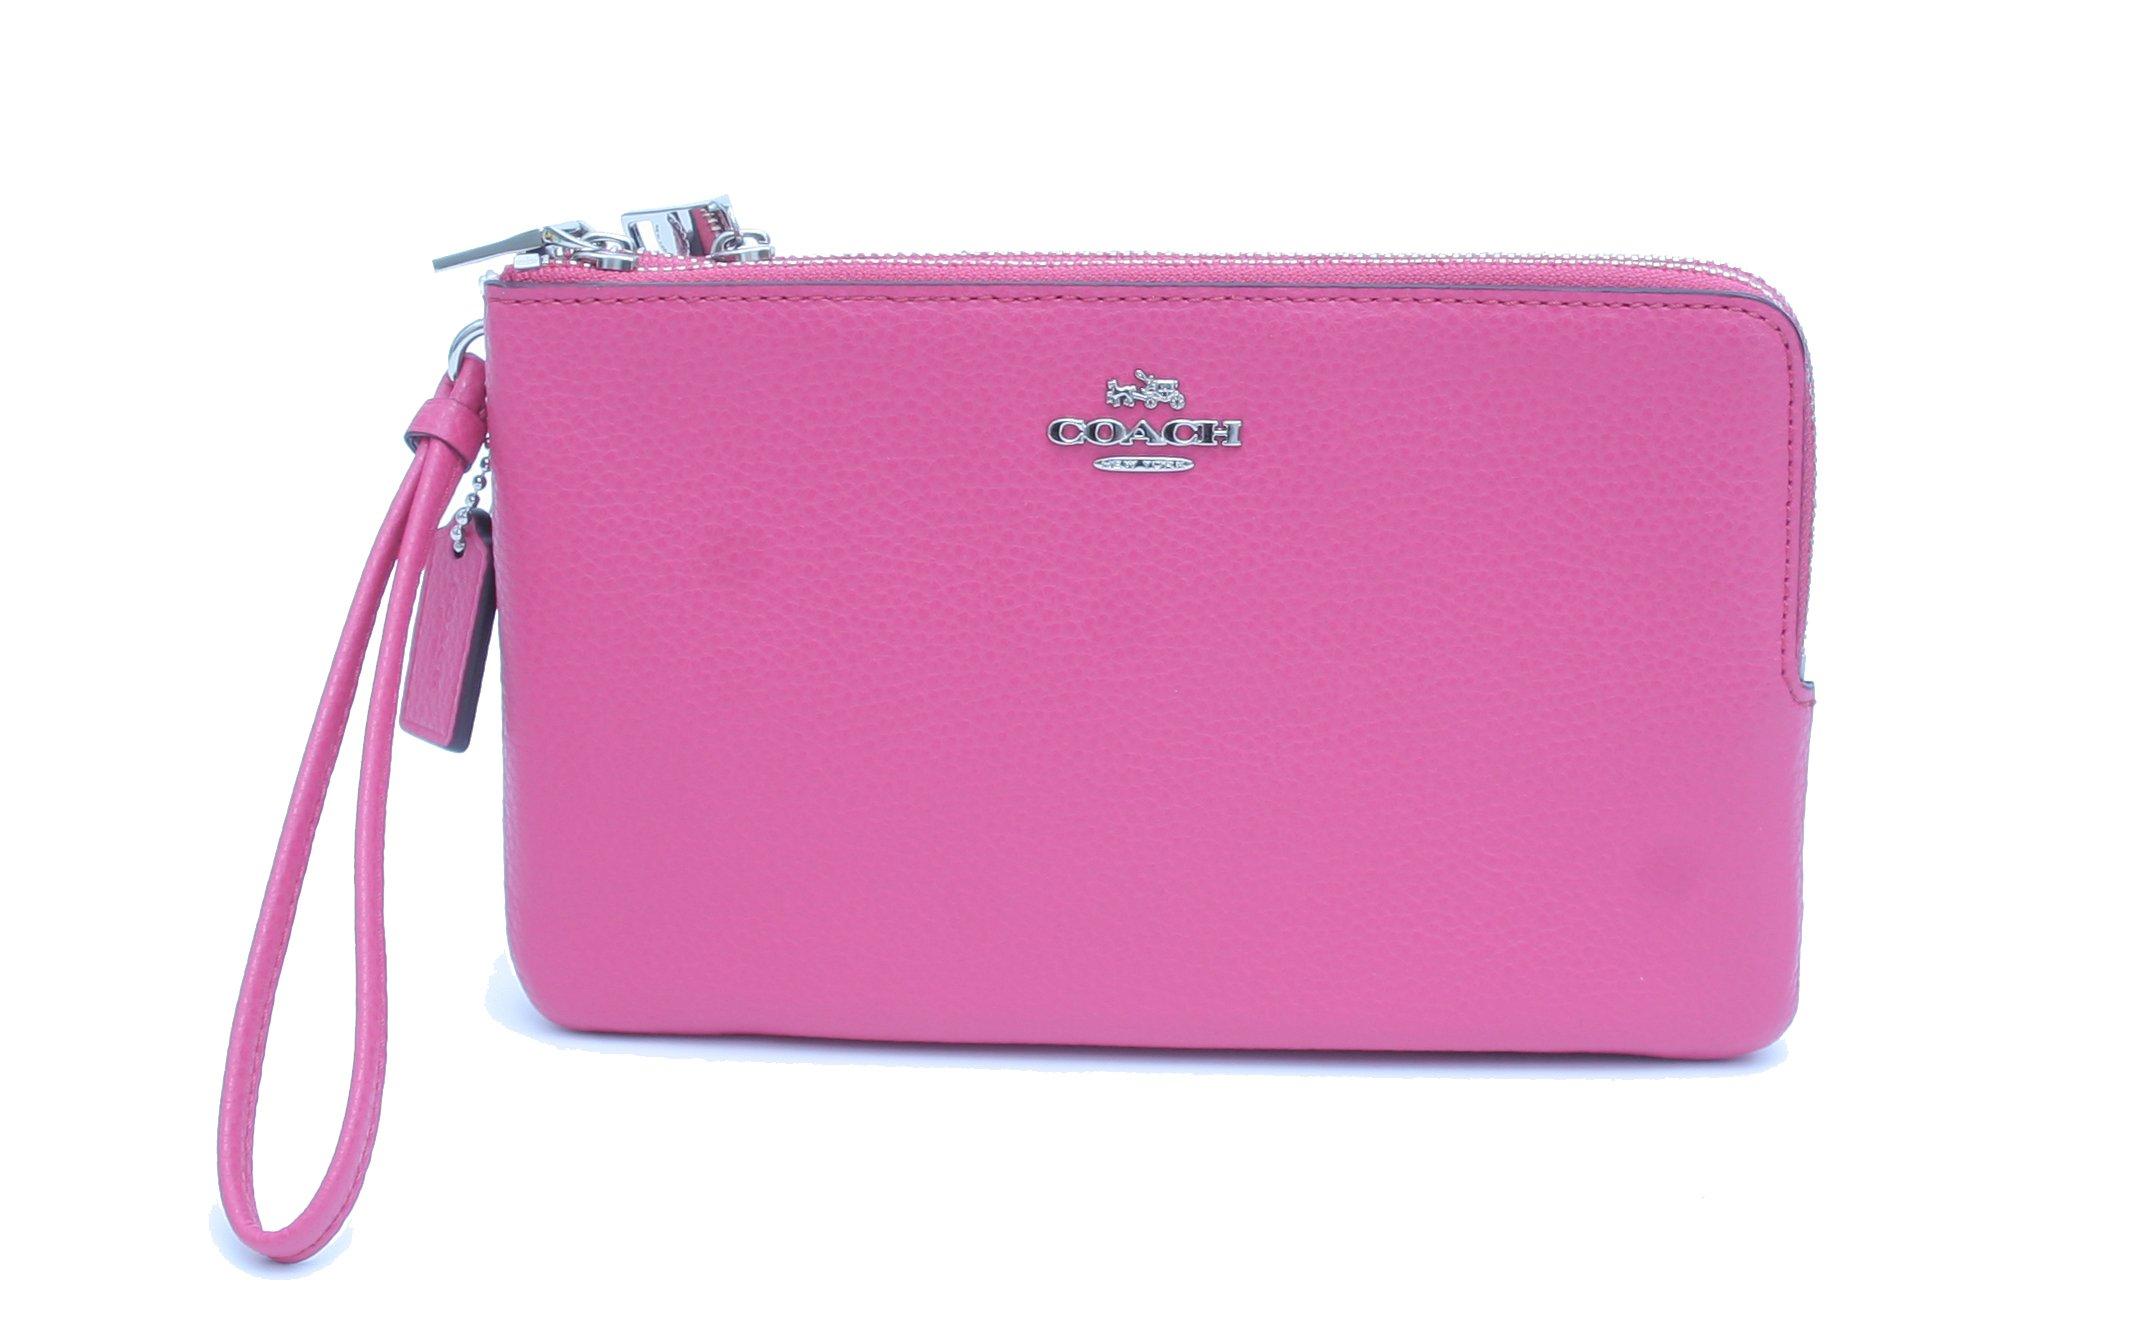 Coach Pebble Leather Double Zip Wristlet Wallet (MAGENTA)